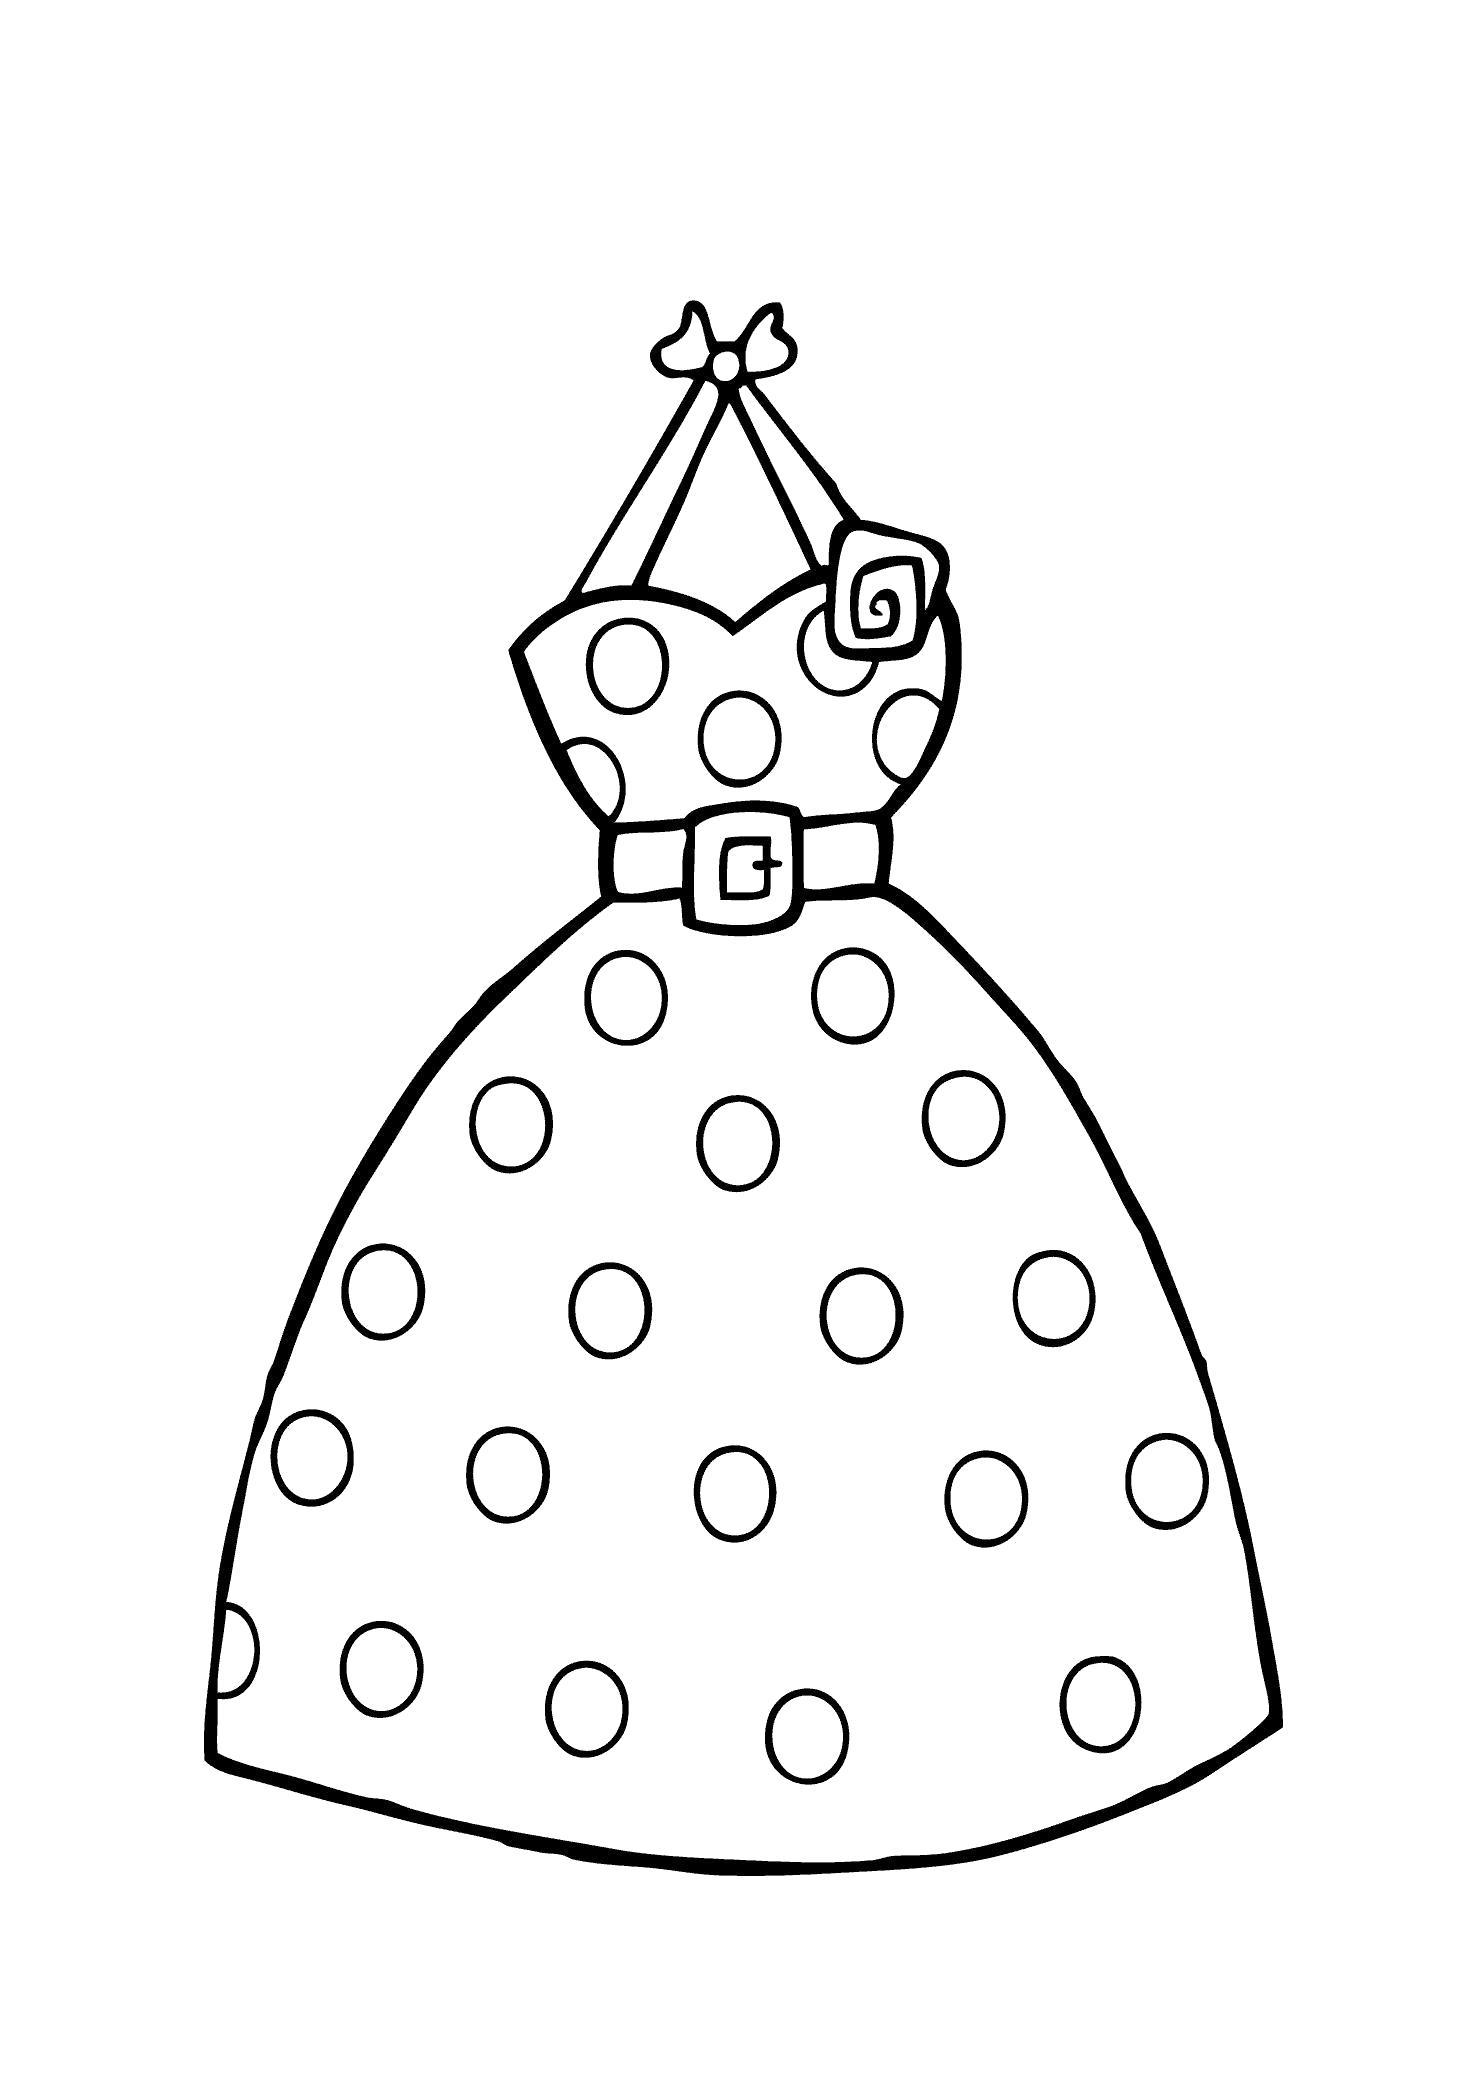 Картинка платье шаблон для